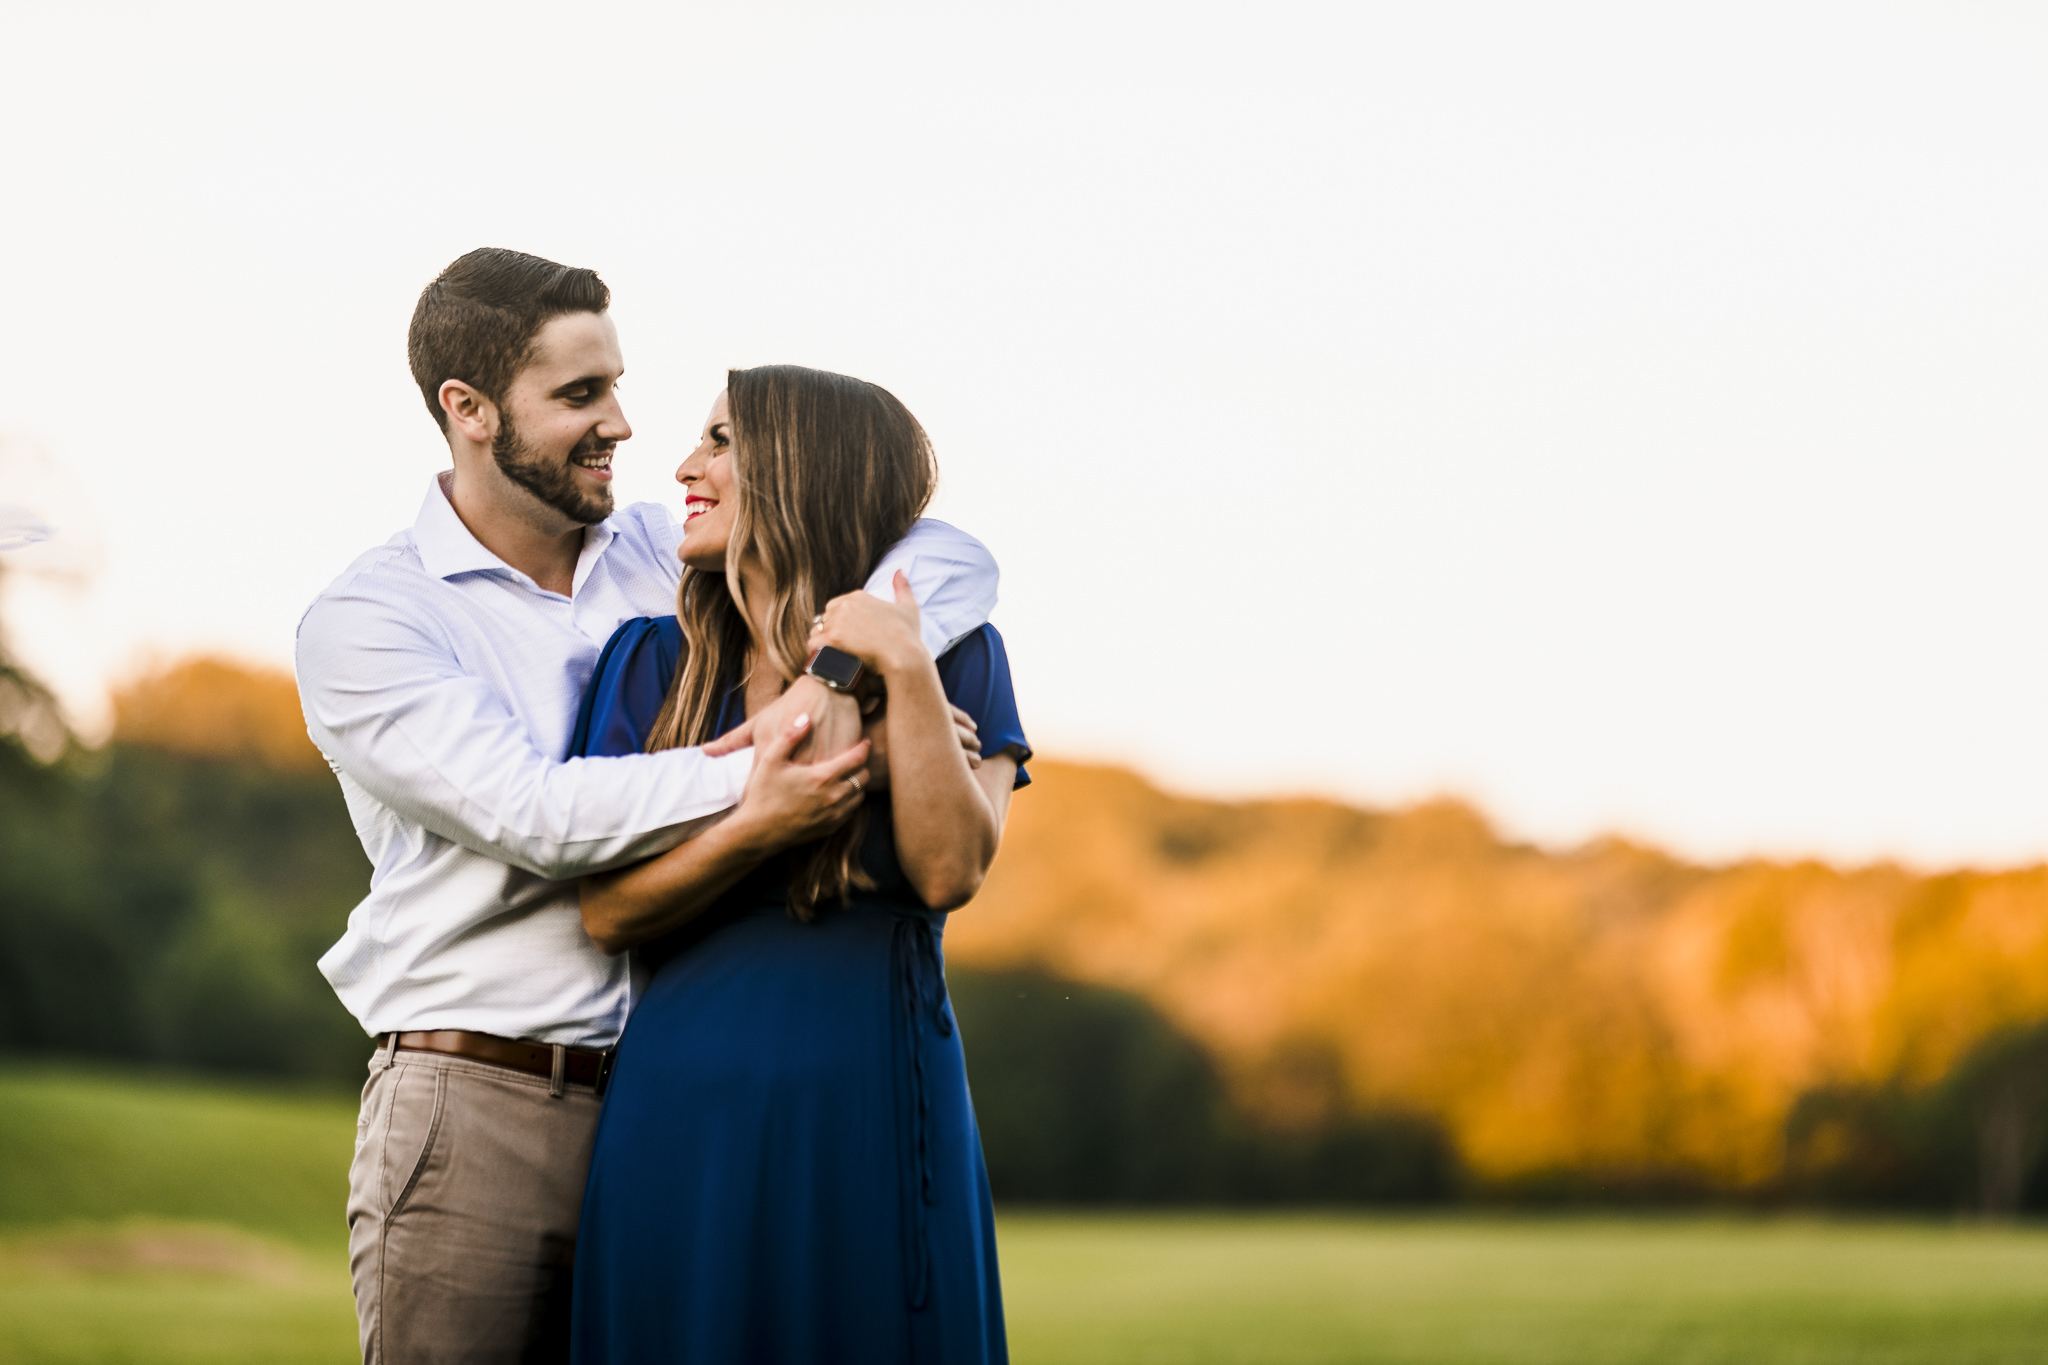 McKowen-Natirar-Park-Engagement-Photos-14.JPG